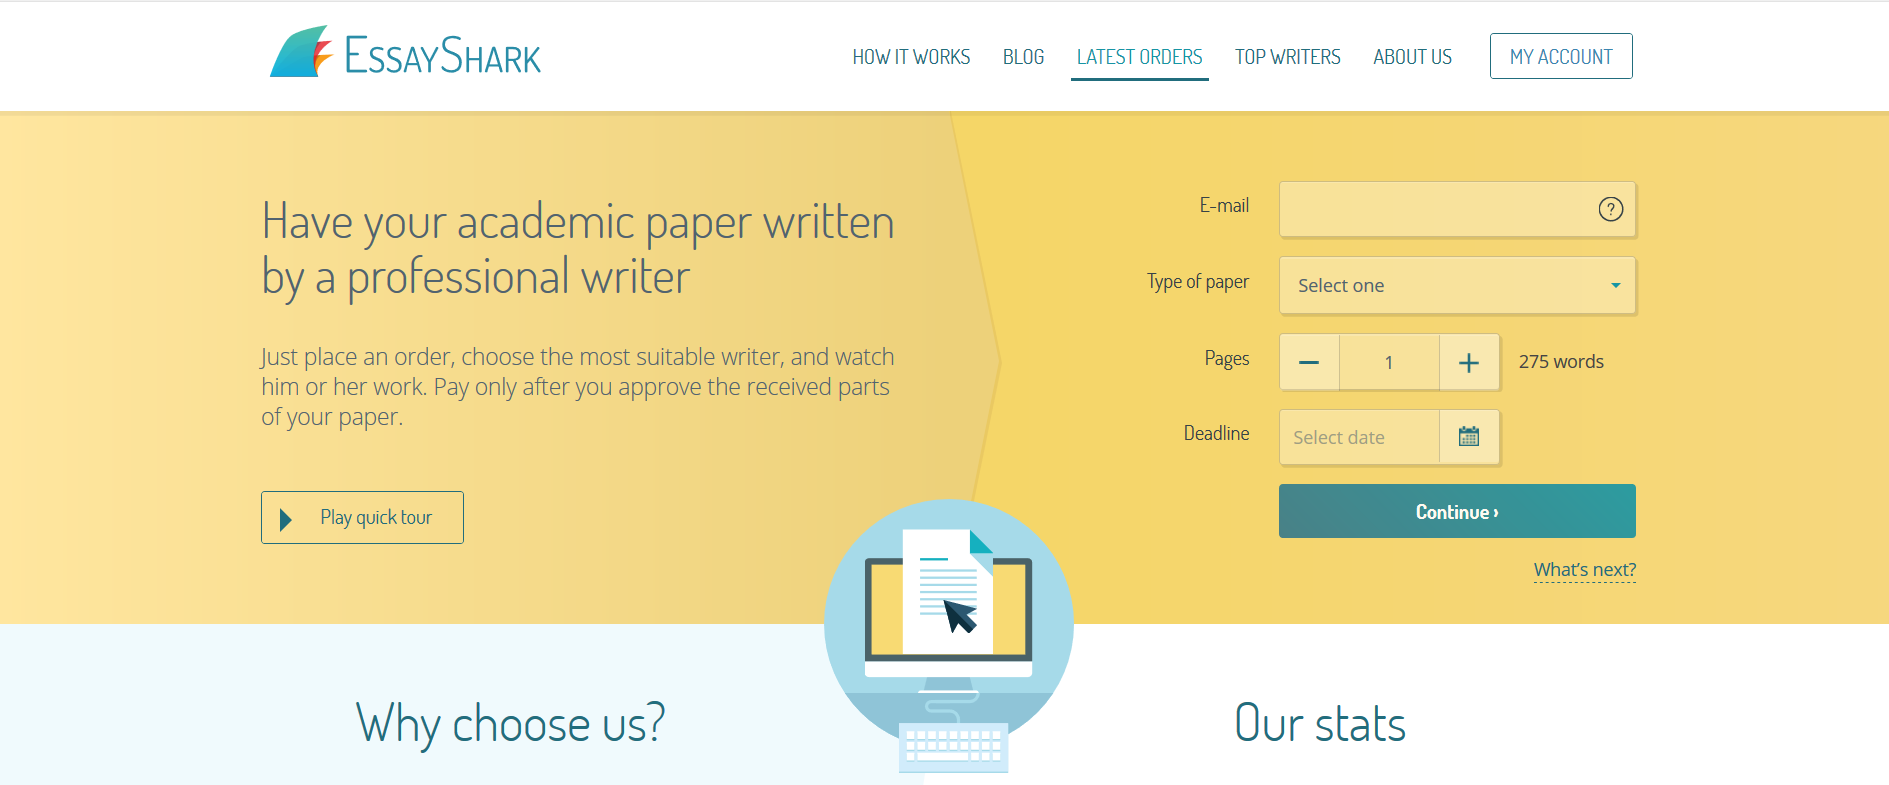 016 Shark Essay Example Screen Wonderful Essayshark Sign Up Topics Questions Full